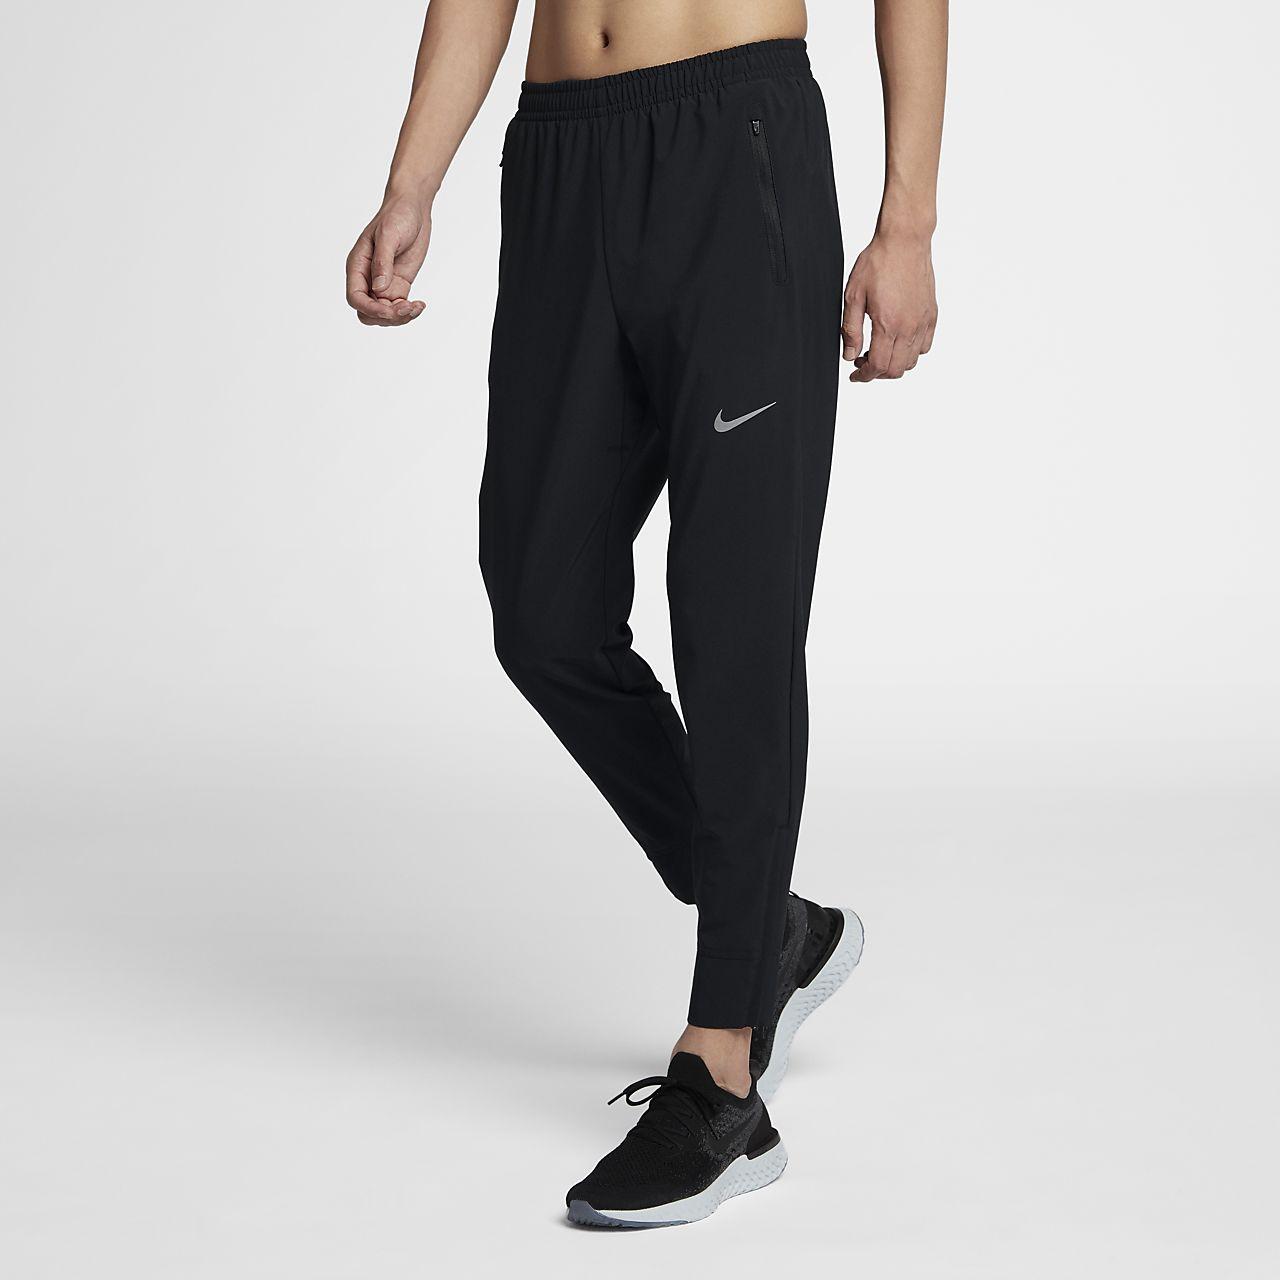 868eefb9 Nike Essential Pantalón de running de tejido Woven - Hombre. Nike.com ES